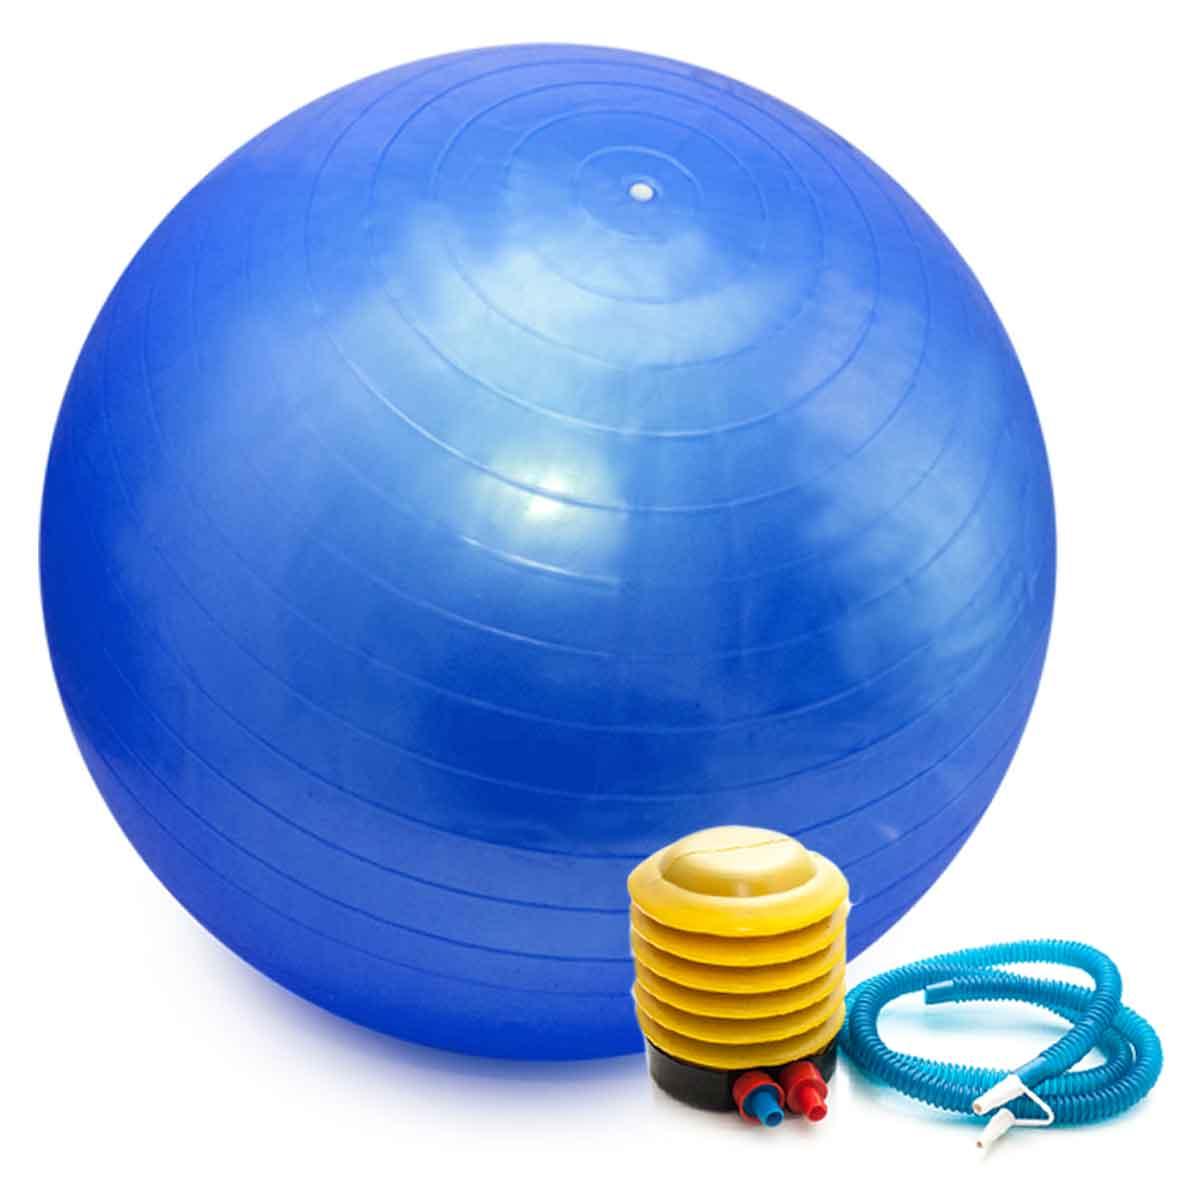 Bola Pilates Yoga Abdominal Ginastica Fitness 65cm C/ Bomba